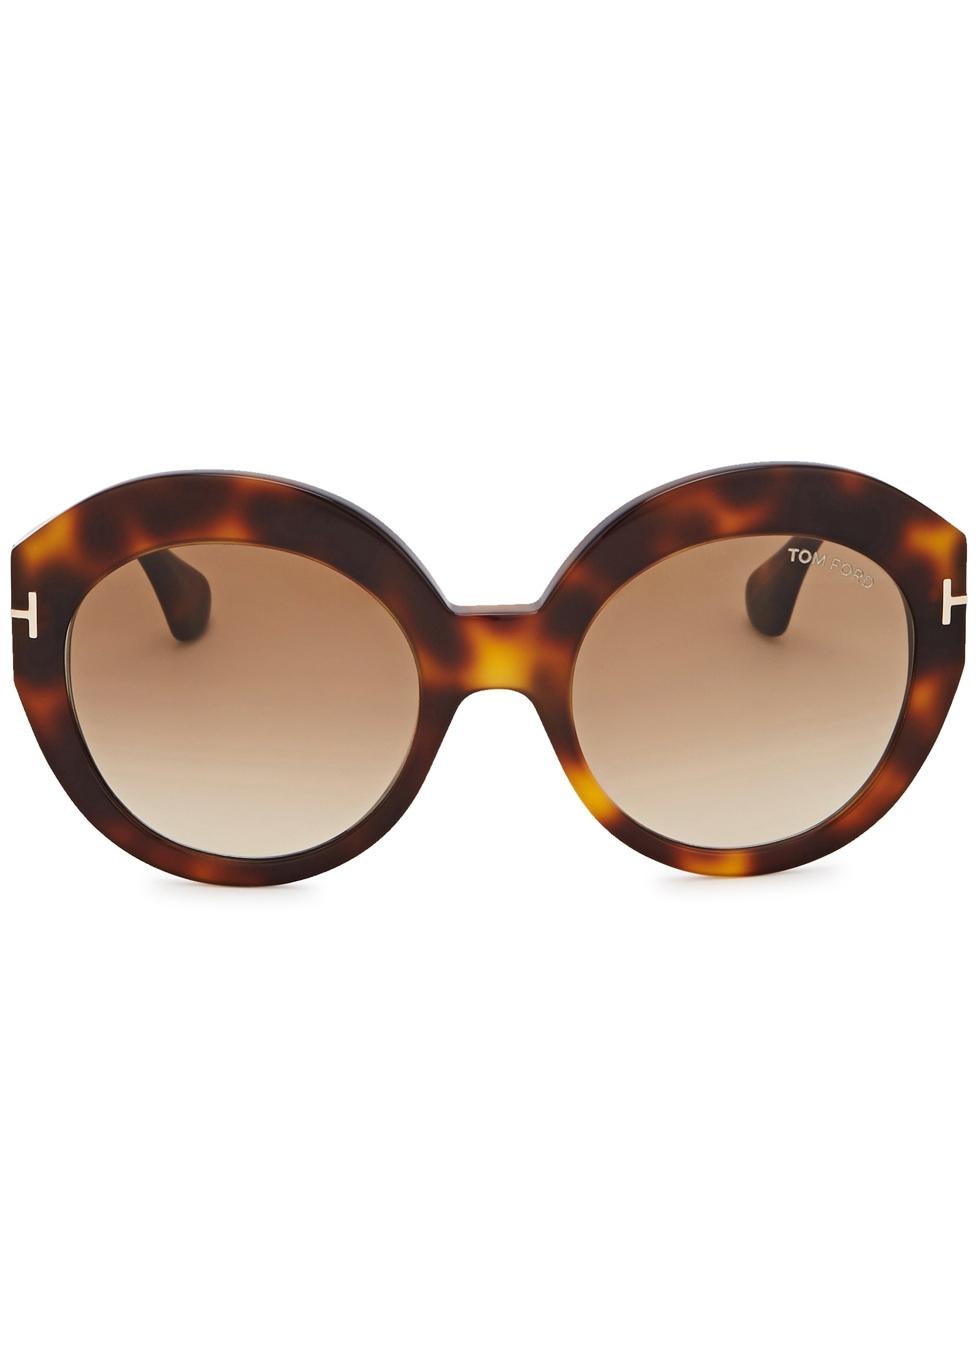 Rachel tortoiseshell round-frame sunglasses - Tom Ford Eyewear